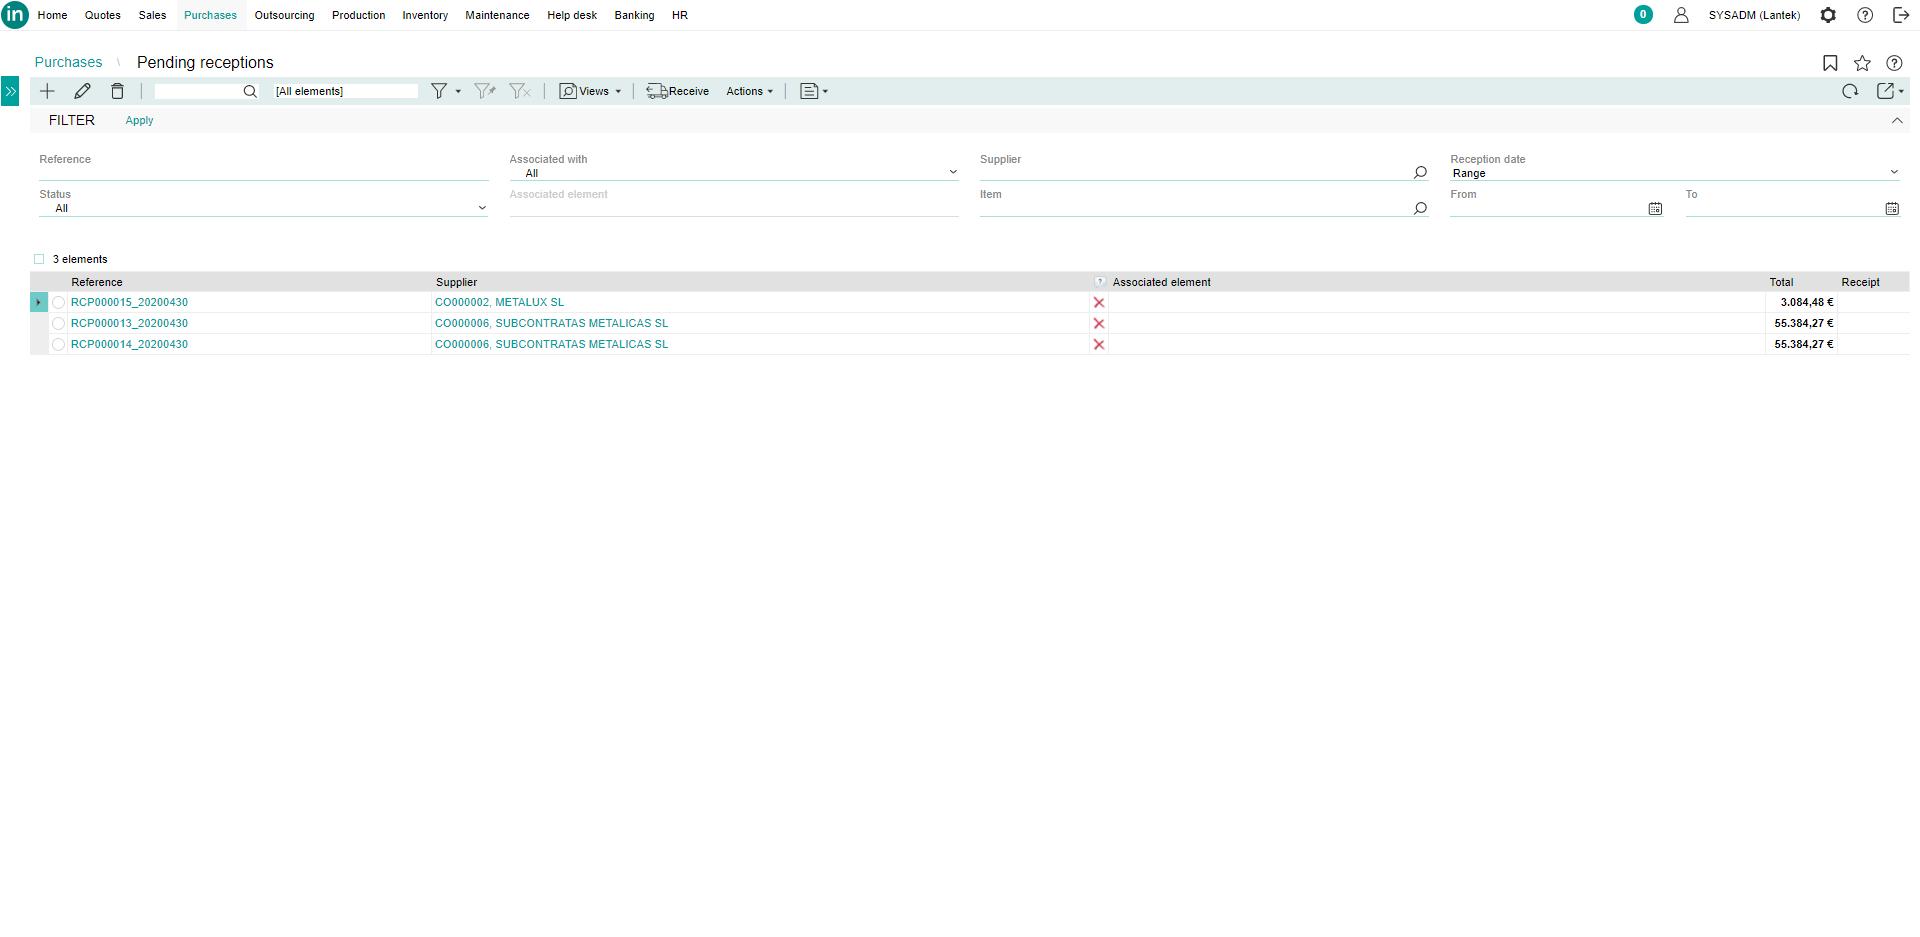 Lantek integra Inventory  - Ausstehende Anlieferungen